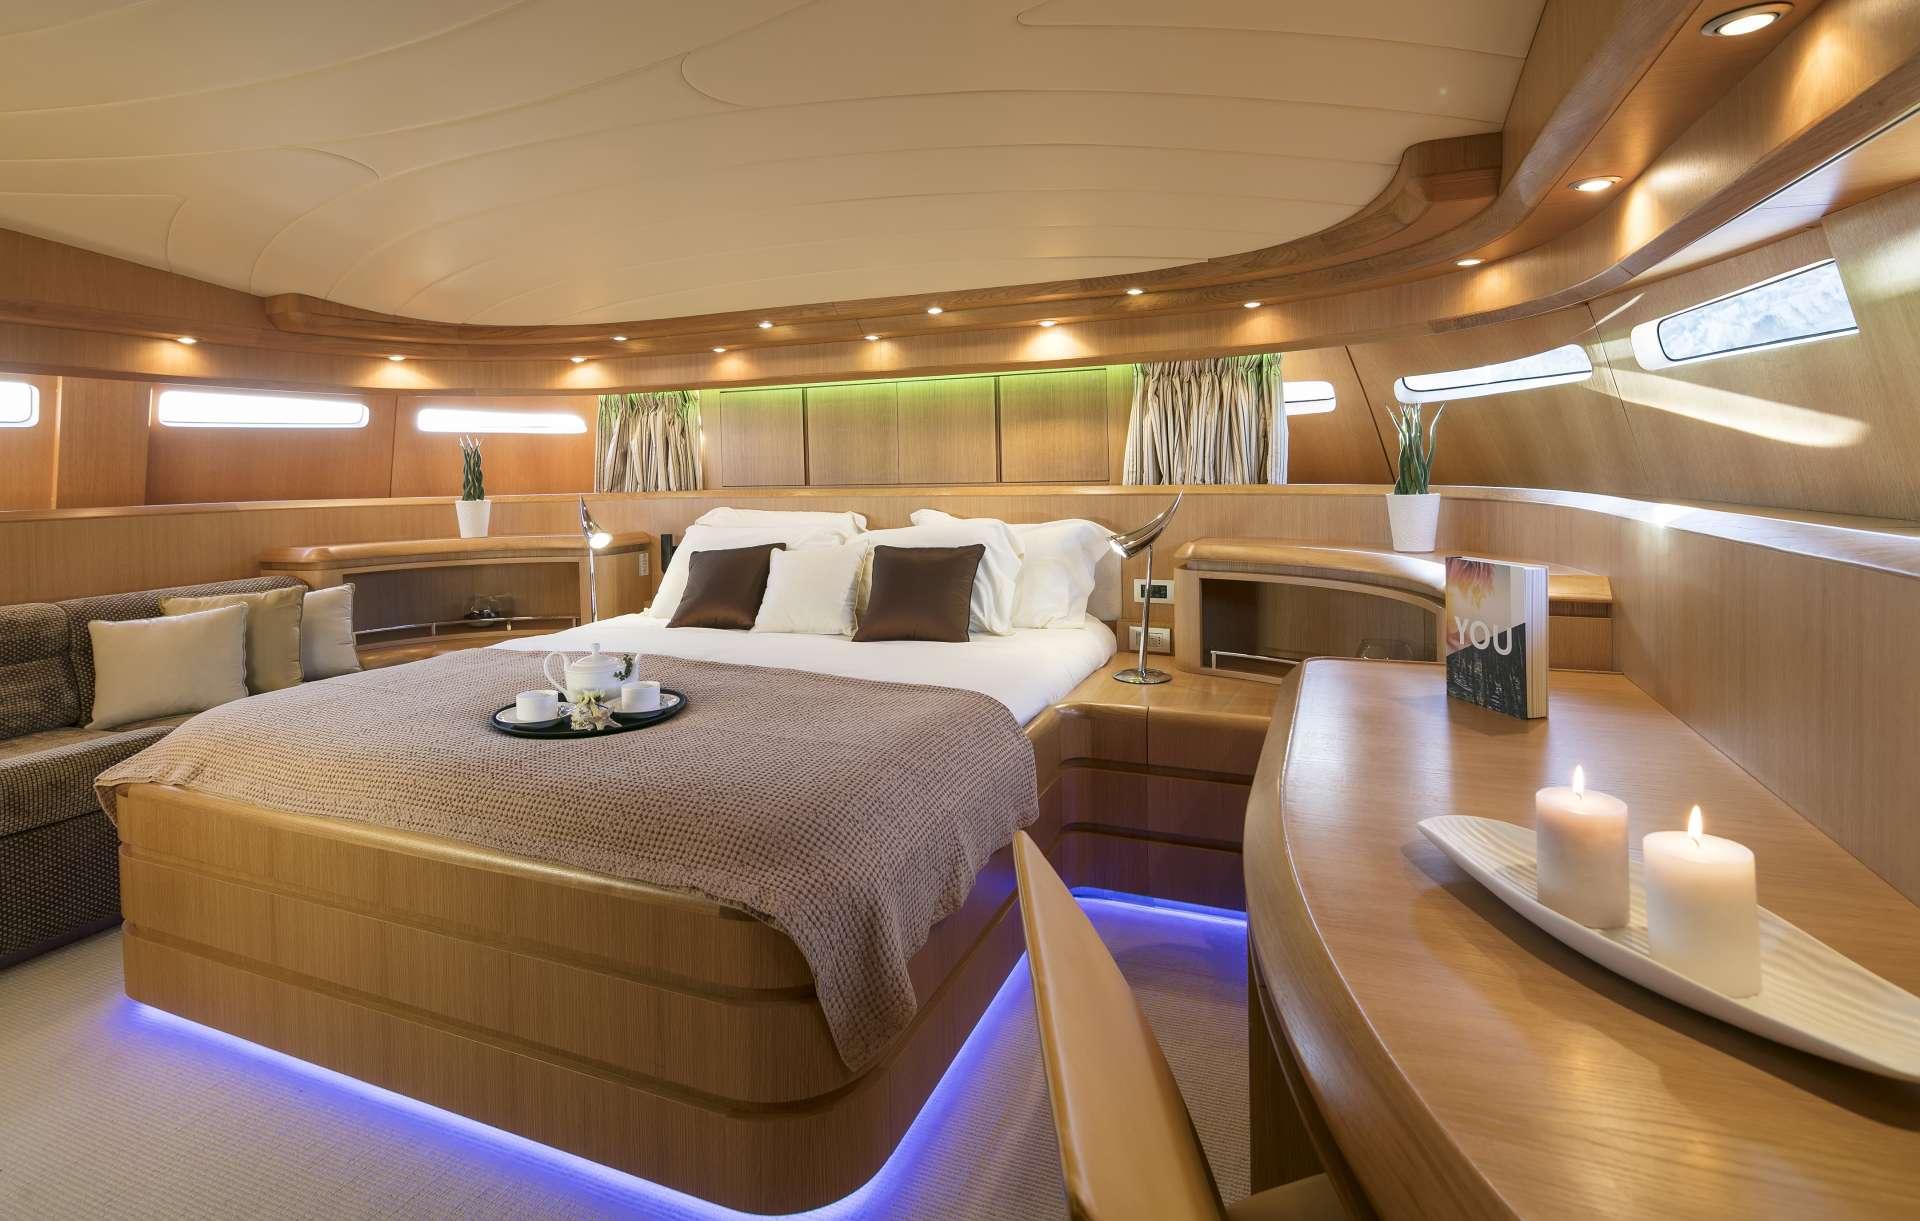 Motor Yacht 'PARIS A' Master Suite, 12 PAX, 6 Crew, 115.00 Ft, 35.06 Meters, Built 2009, Majora, Refit Year 2013